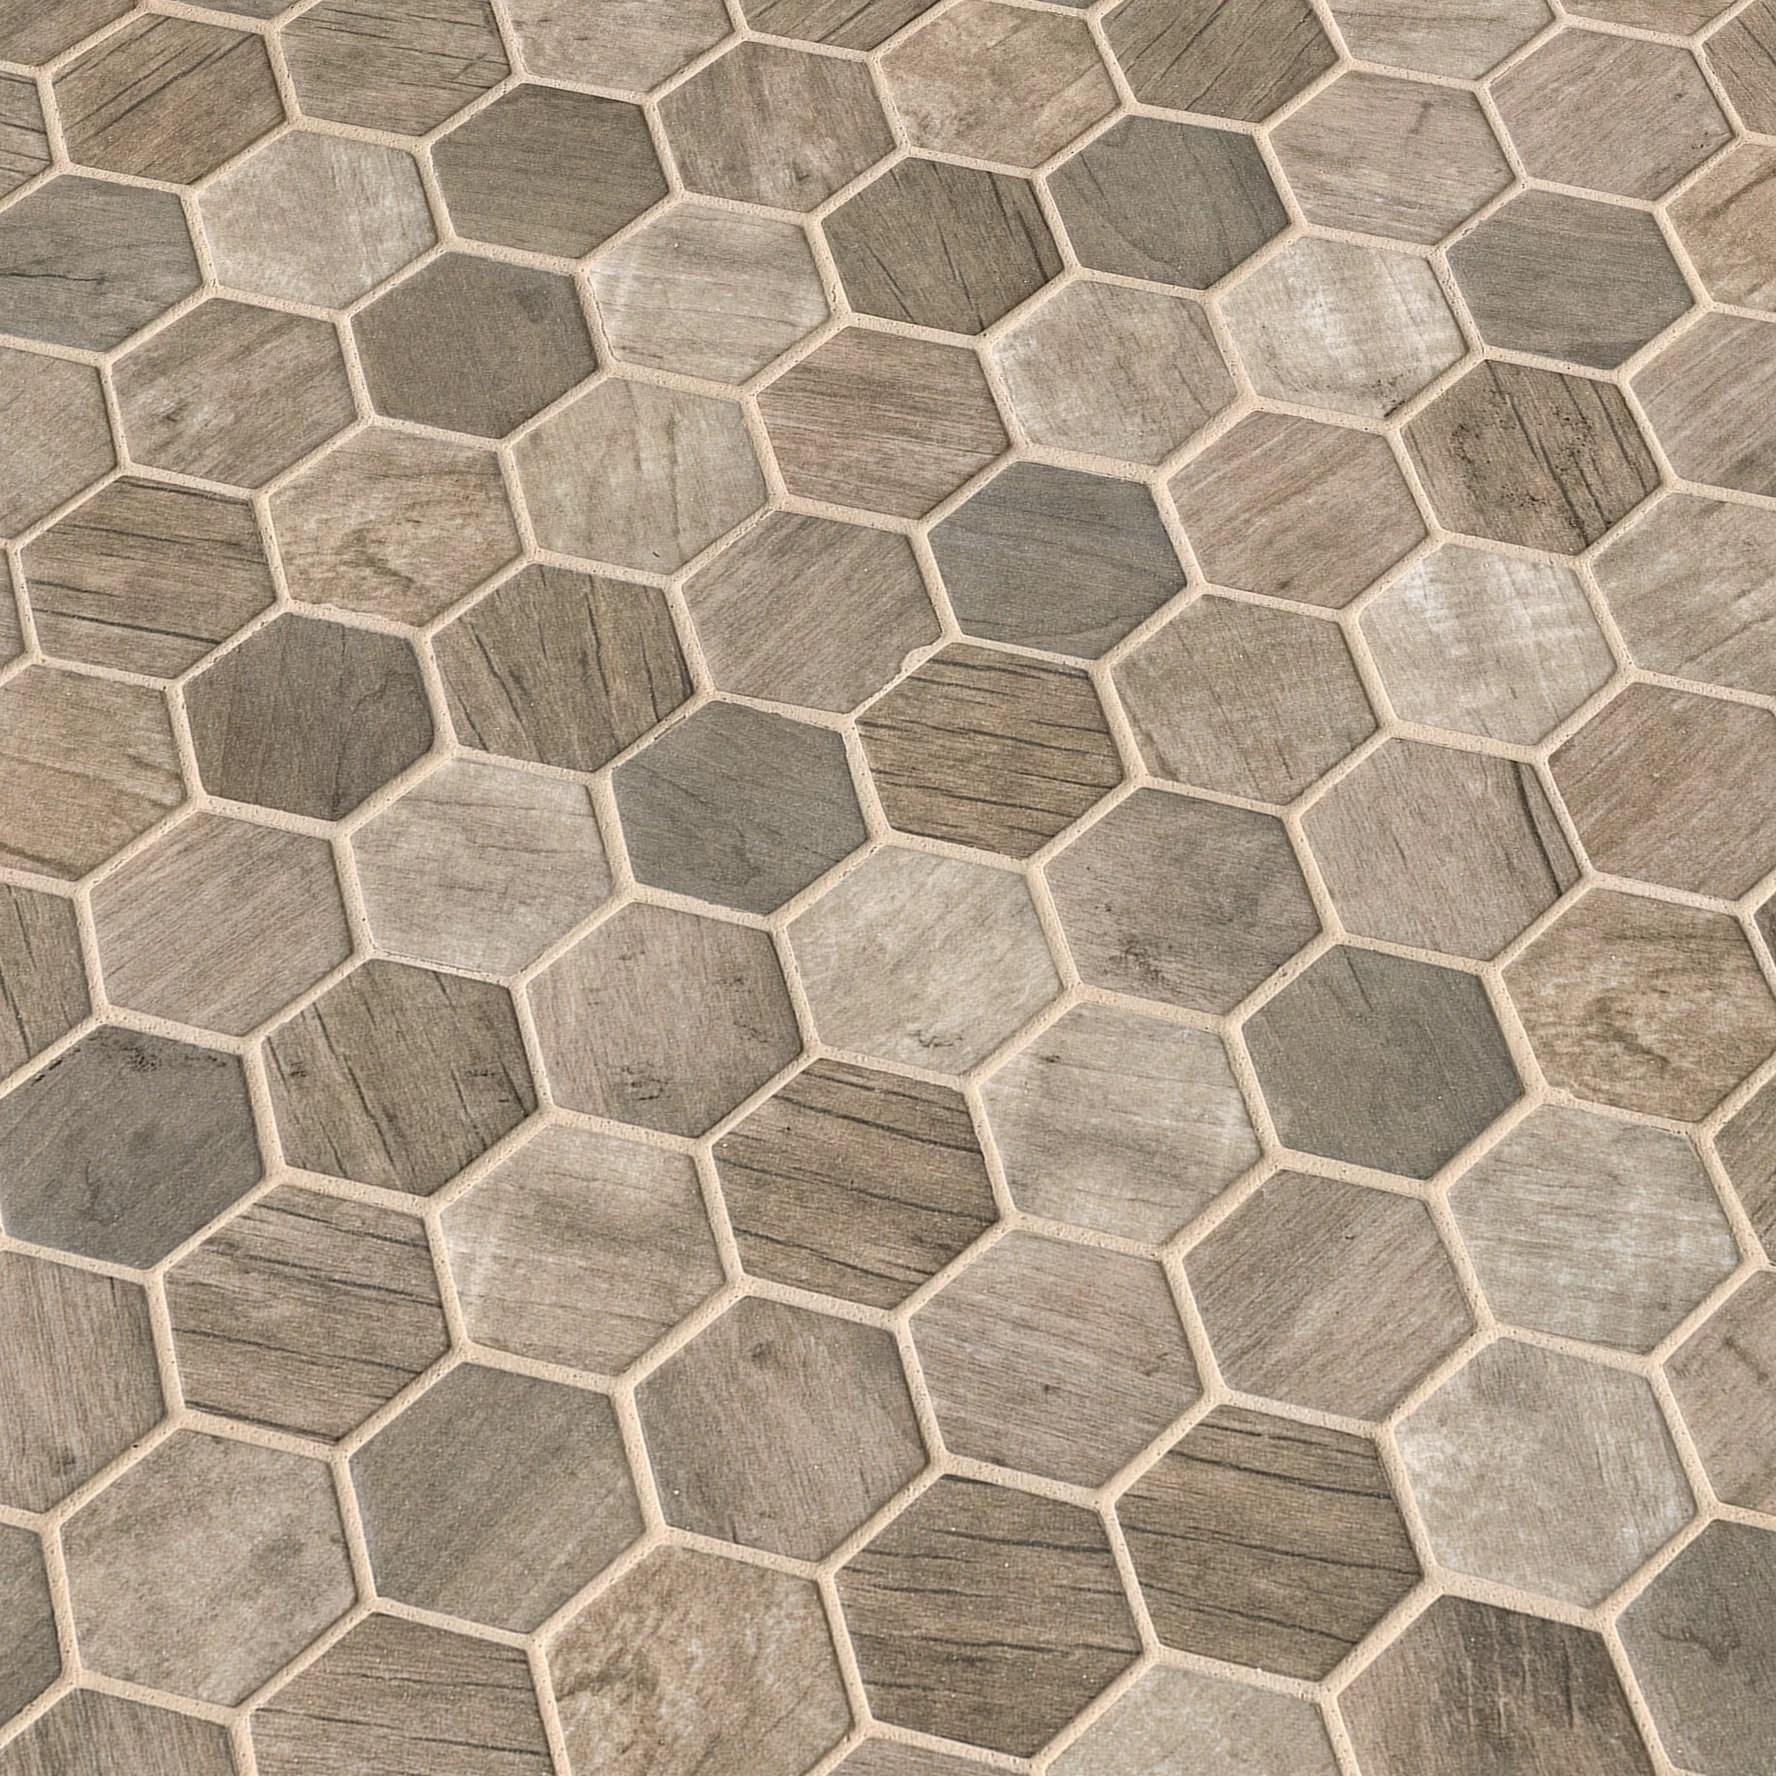 msi driftwood hexagon 2 x 2 glass wood look tile wayfair